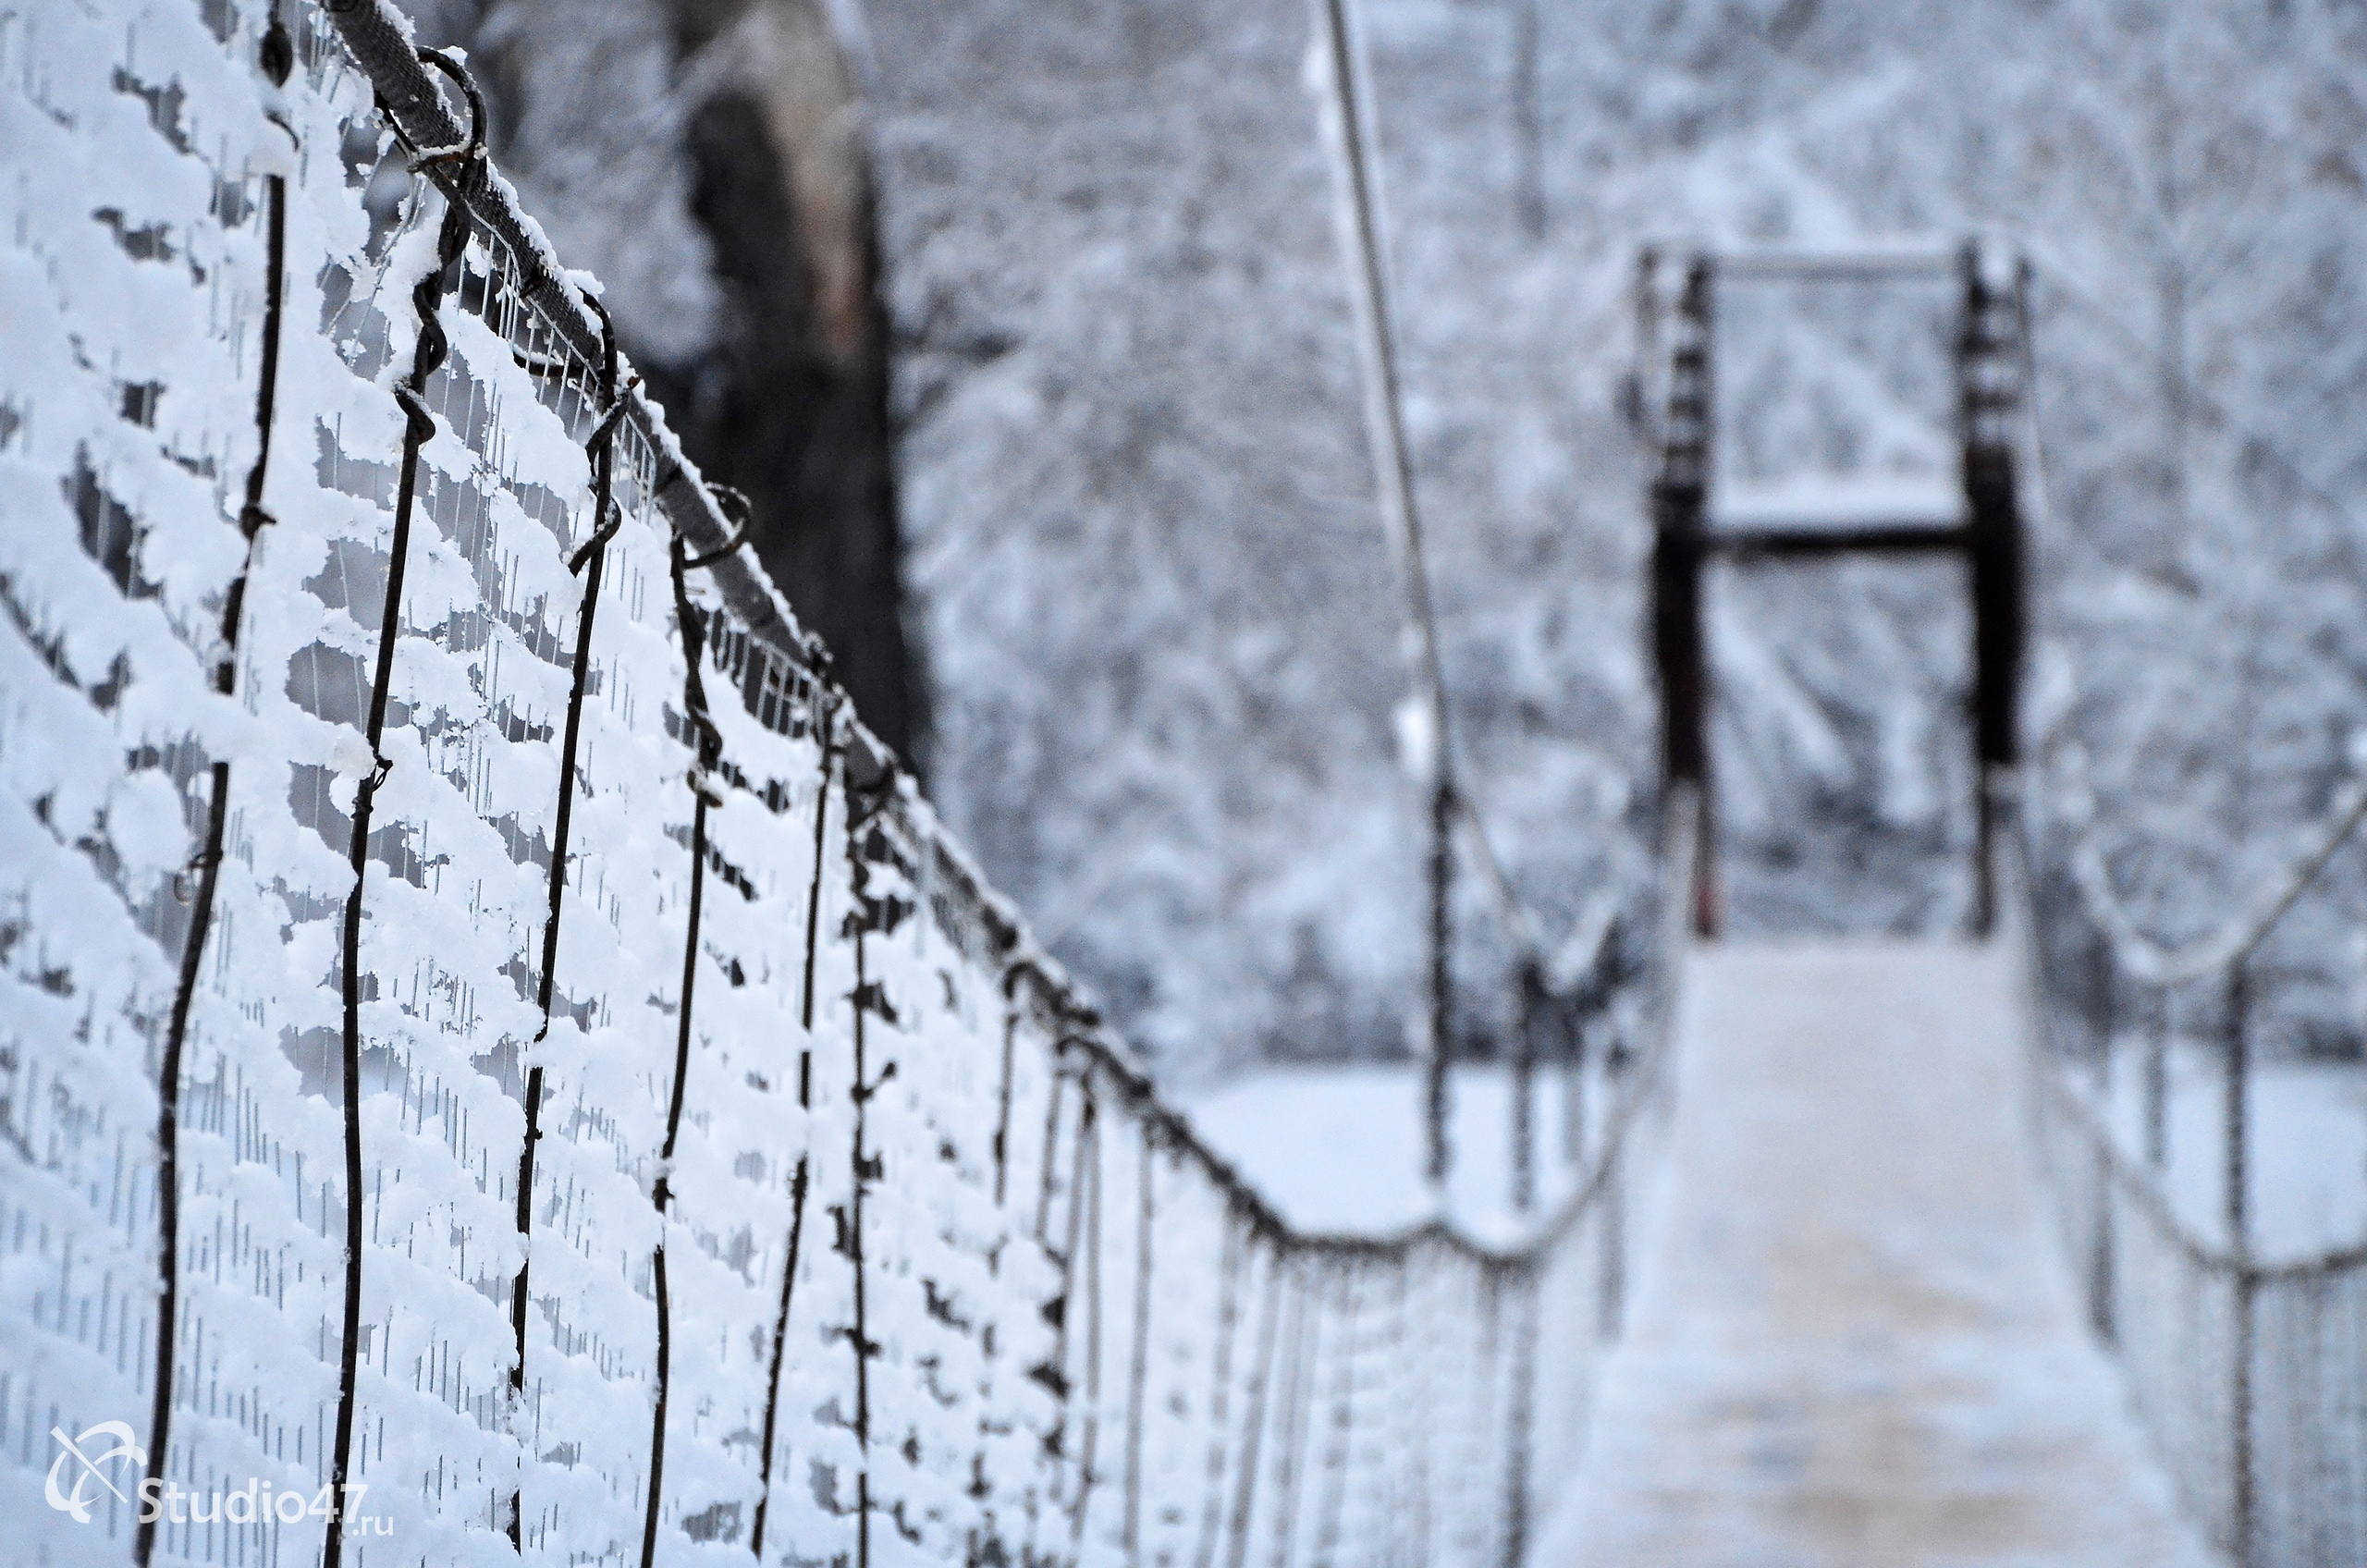 Подвесной мост в Борисоглебске